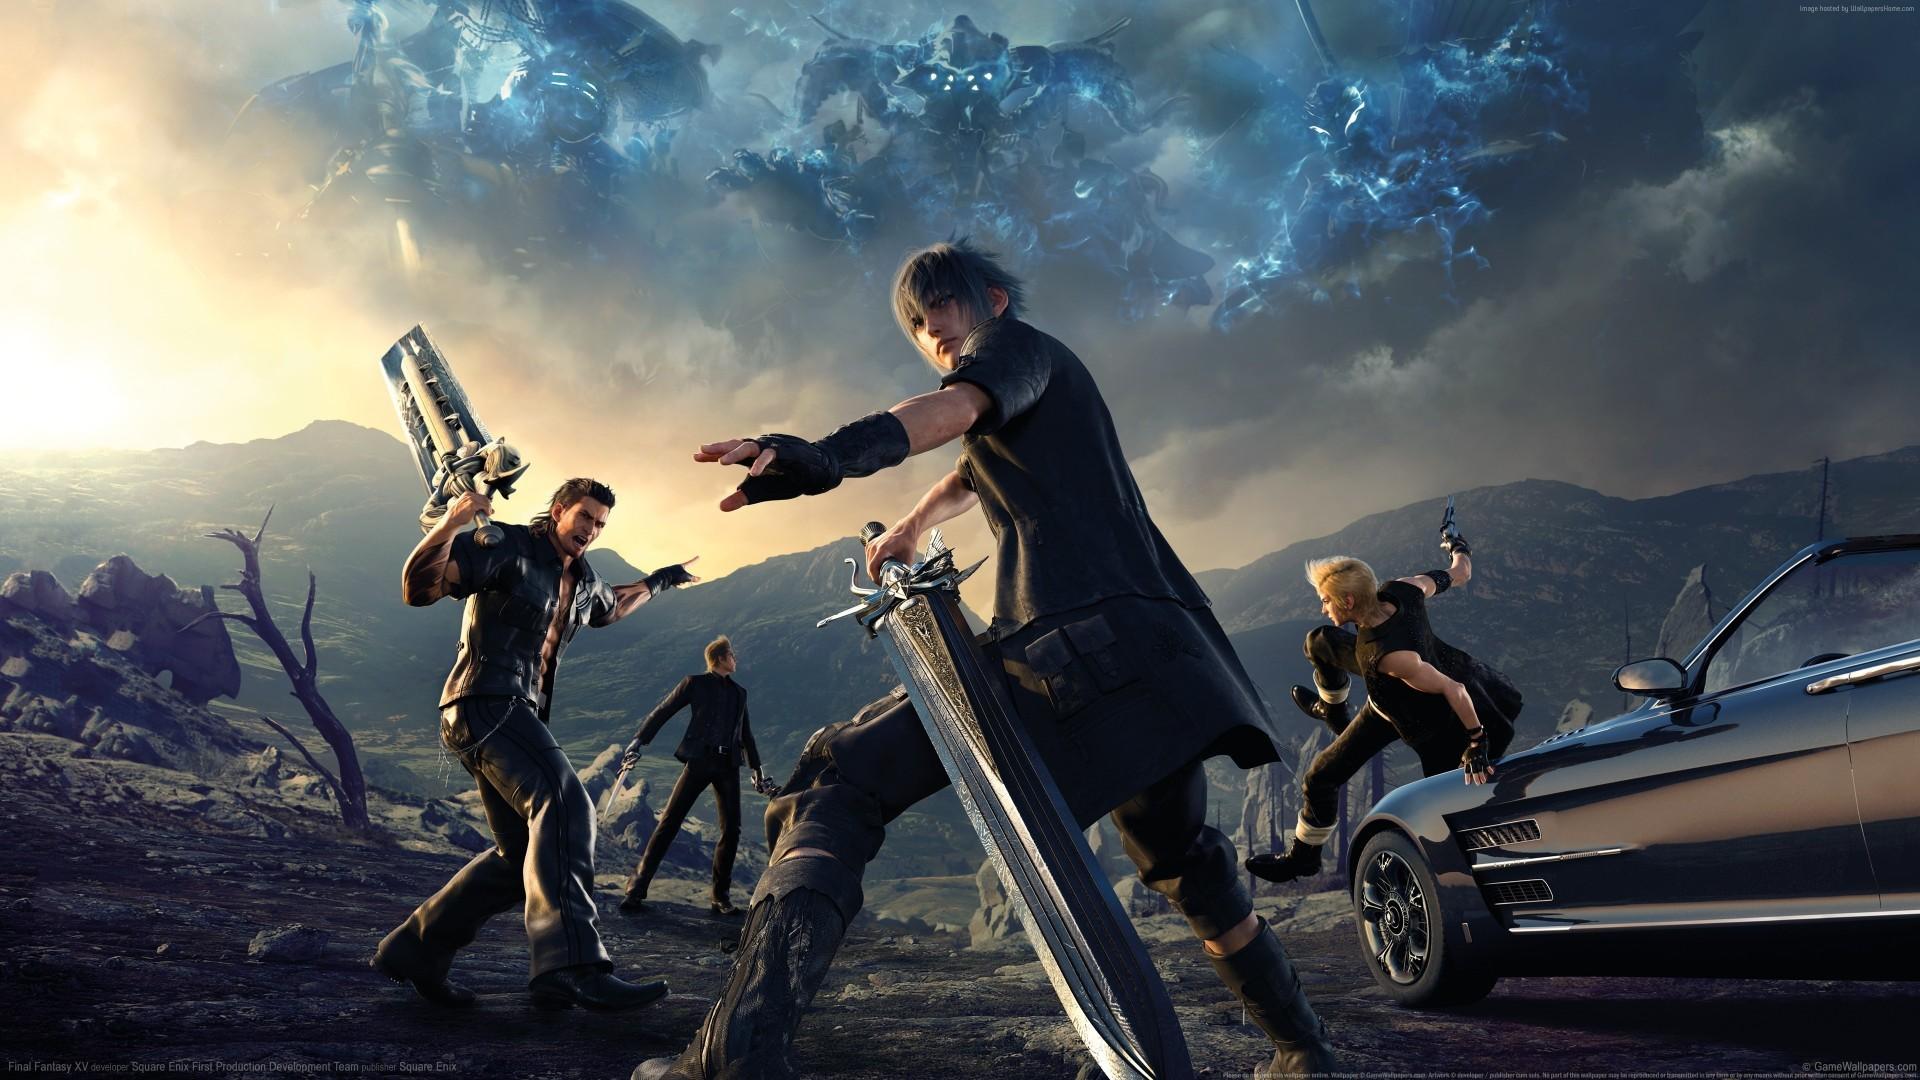 Final Fantasy XV Episode Gladiolus 4K hd wallpaper